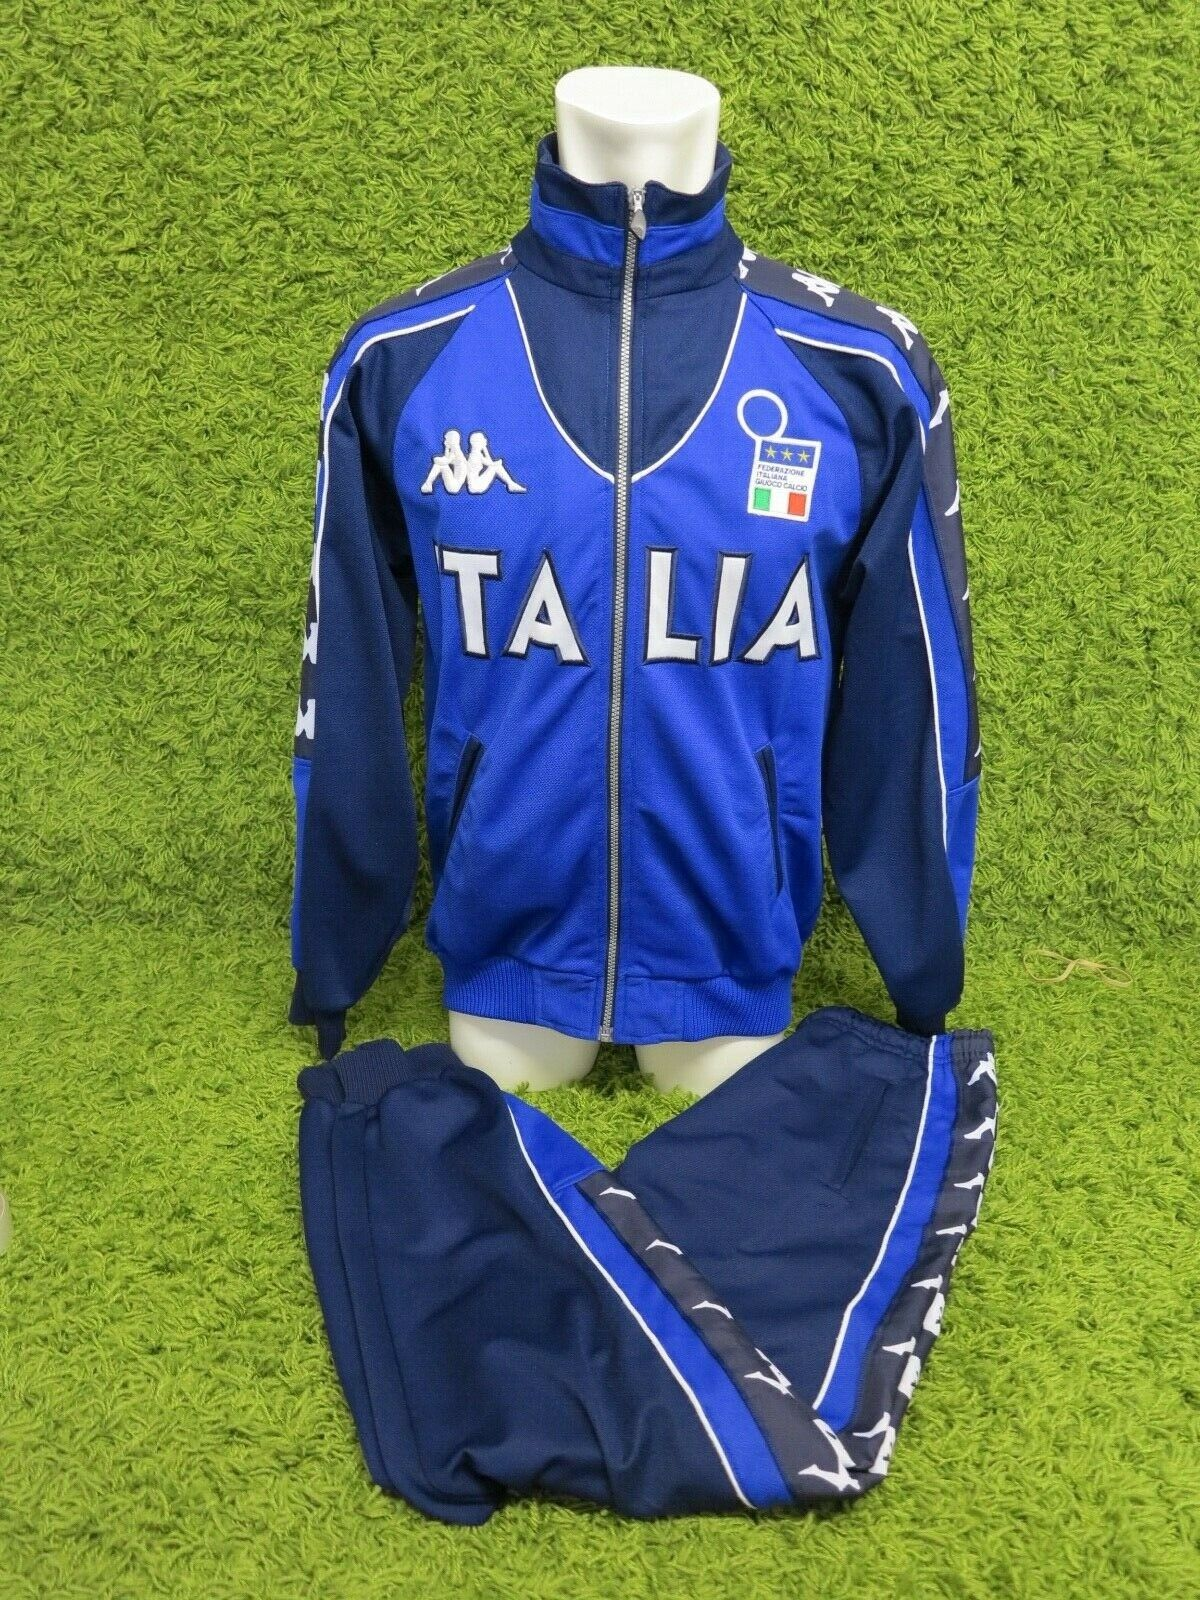 20002001 Italia Training Calcio Completo Tuta Da Ginnastica euro 2000 Kappa Blu M RARO